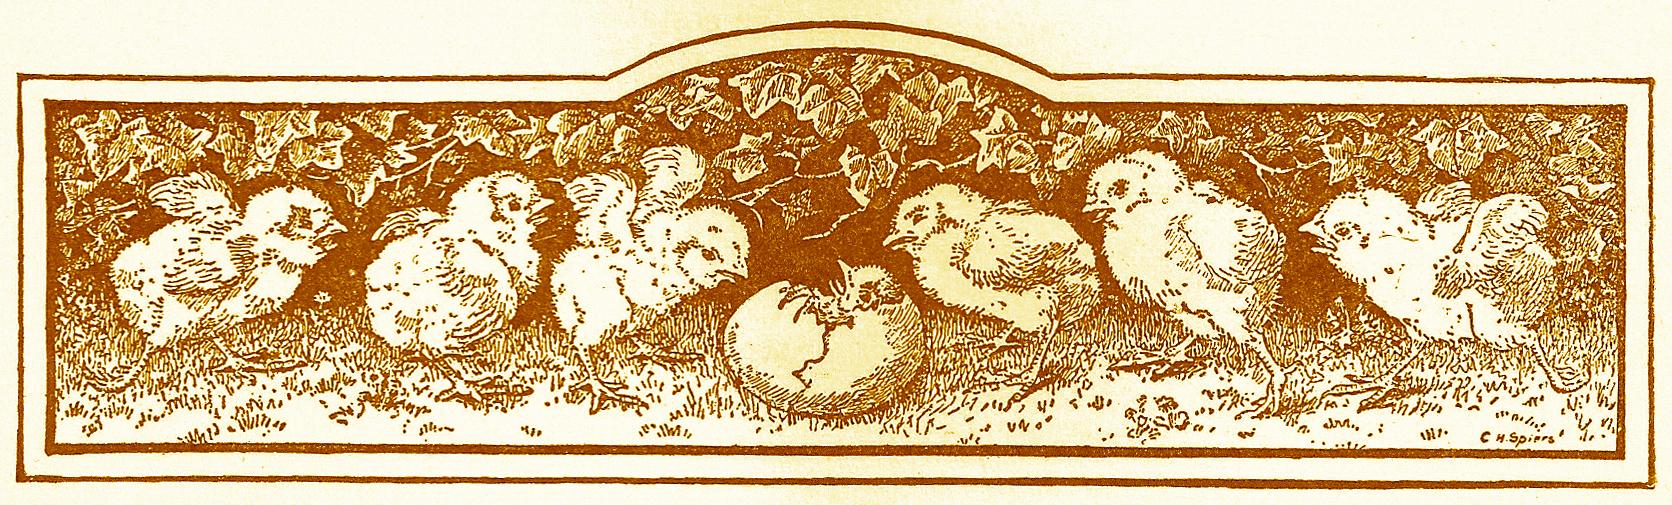 Free vintage clip art printers ornament easter chicks